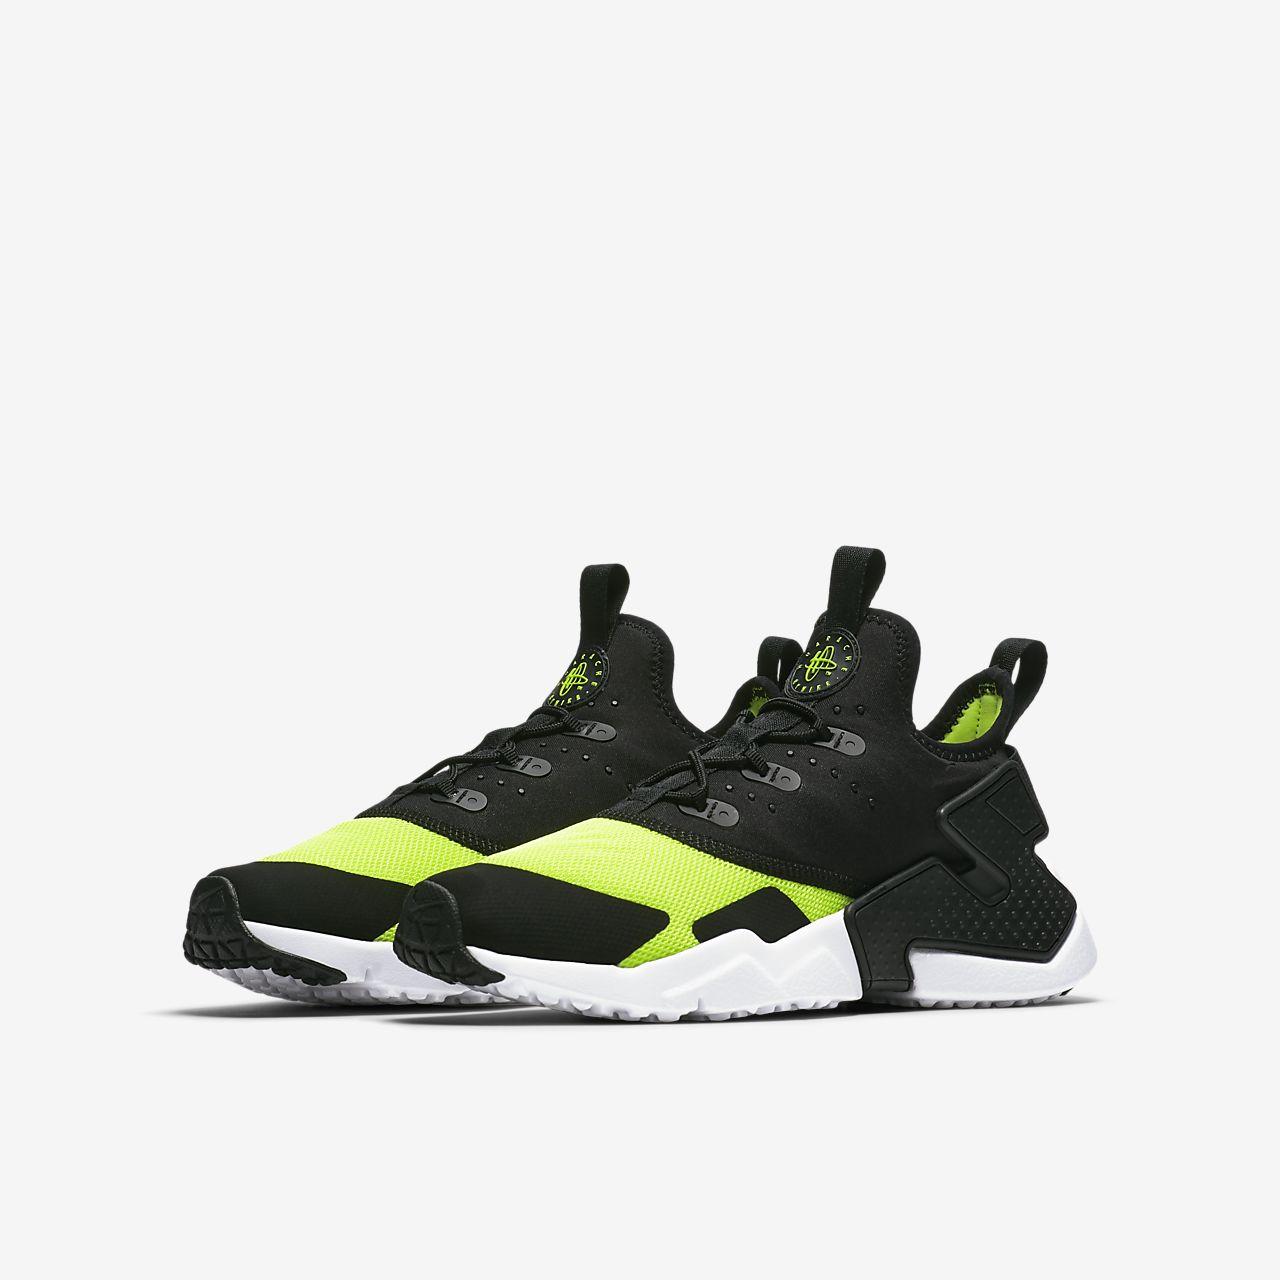 58b49a56caf9c Chaussure Nike Huarache Run Drift pour Enfant plus âgé ...